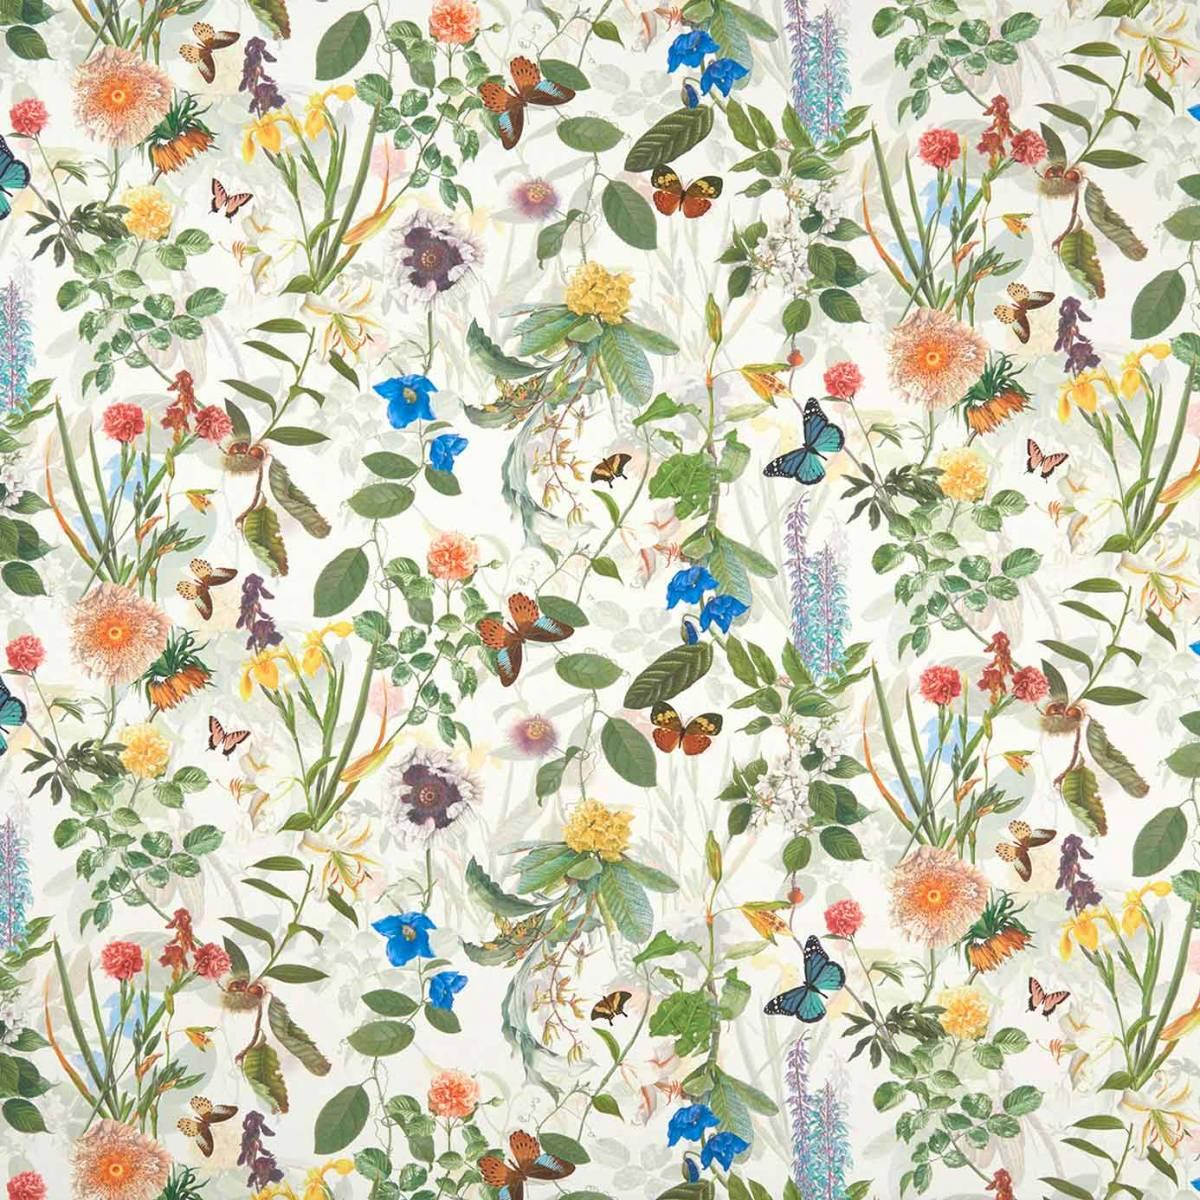 Studio G Country Garden Fabrics Secret Fabric